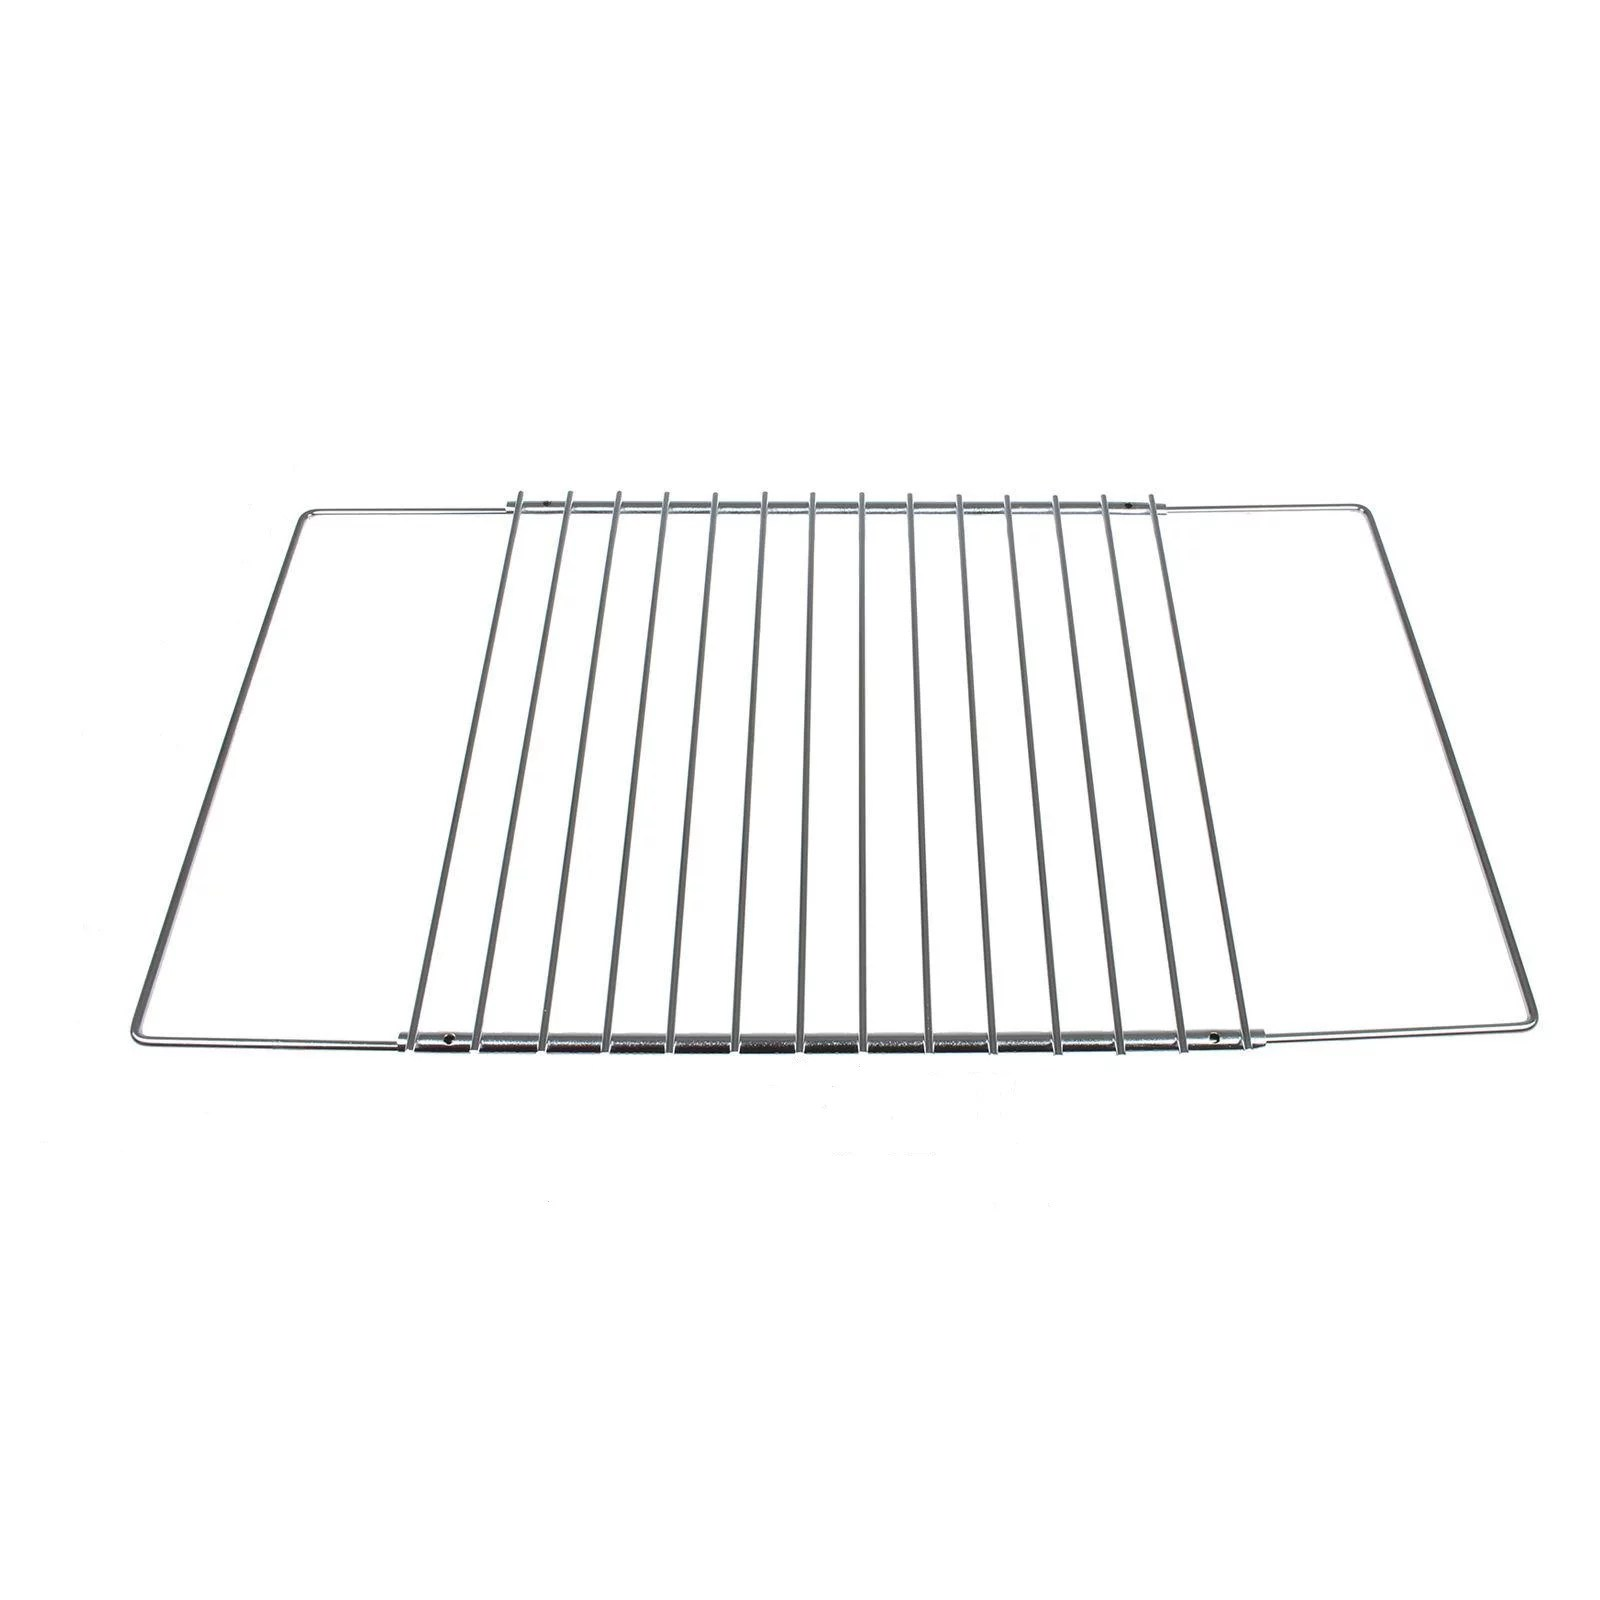 universal adjustable oven cooker shelf rack for frigidaire ge kenmore ovens walmart com